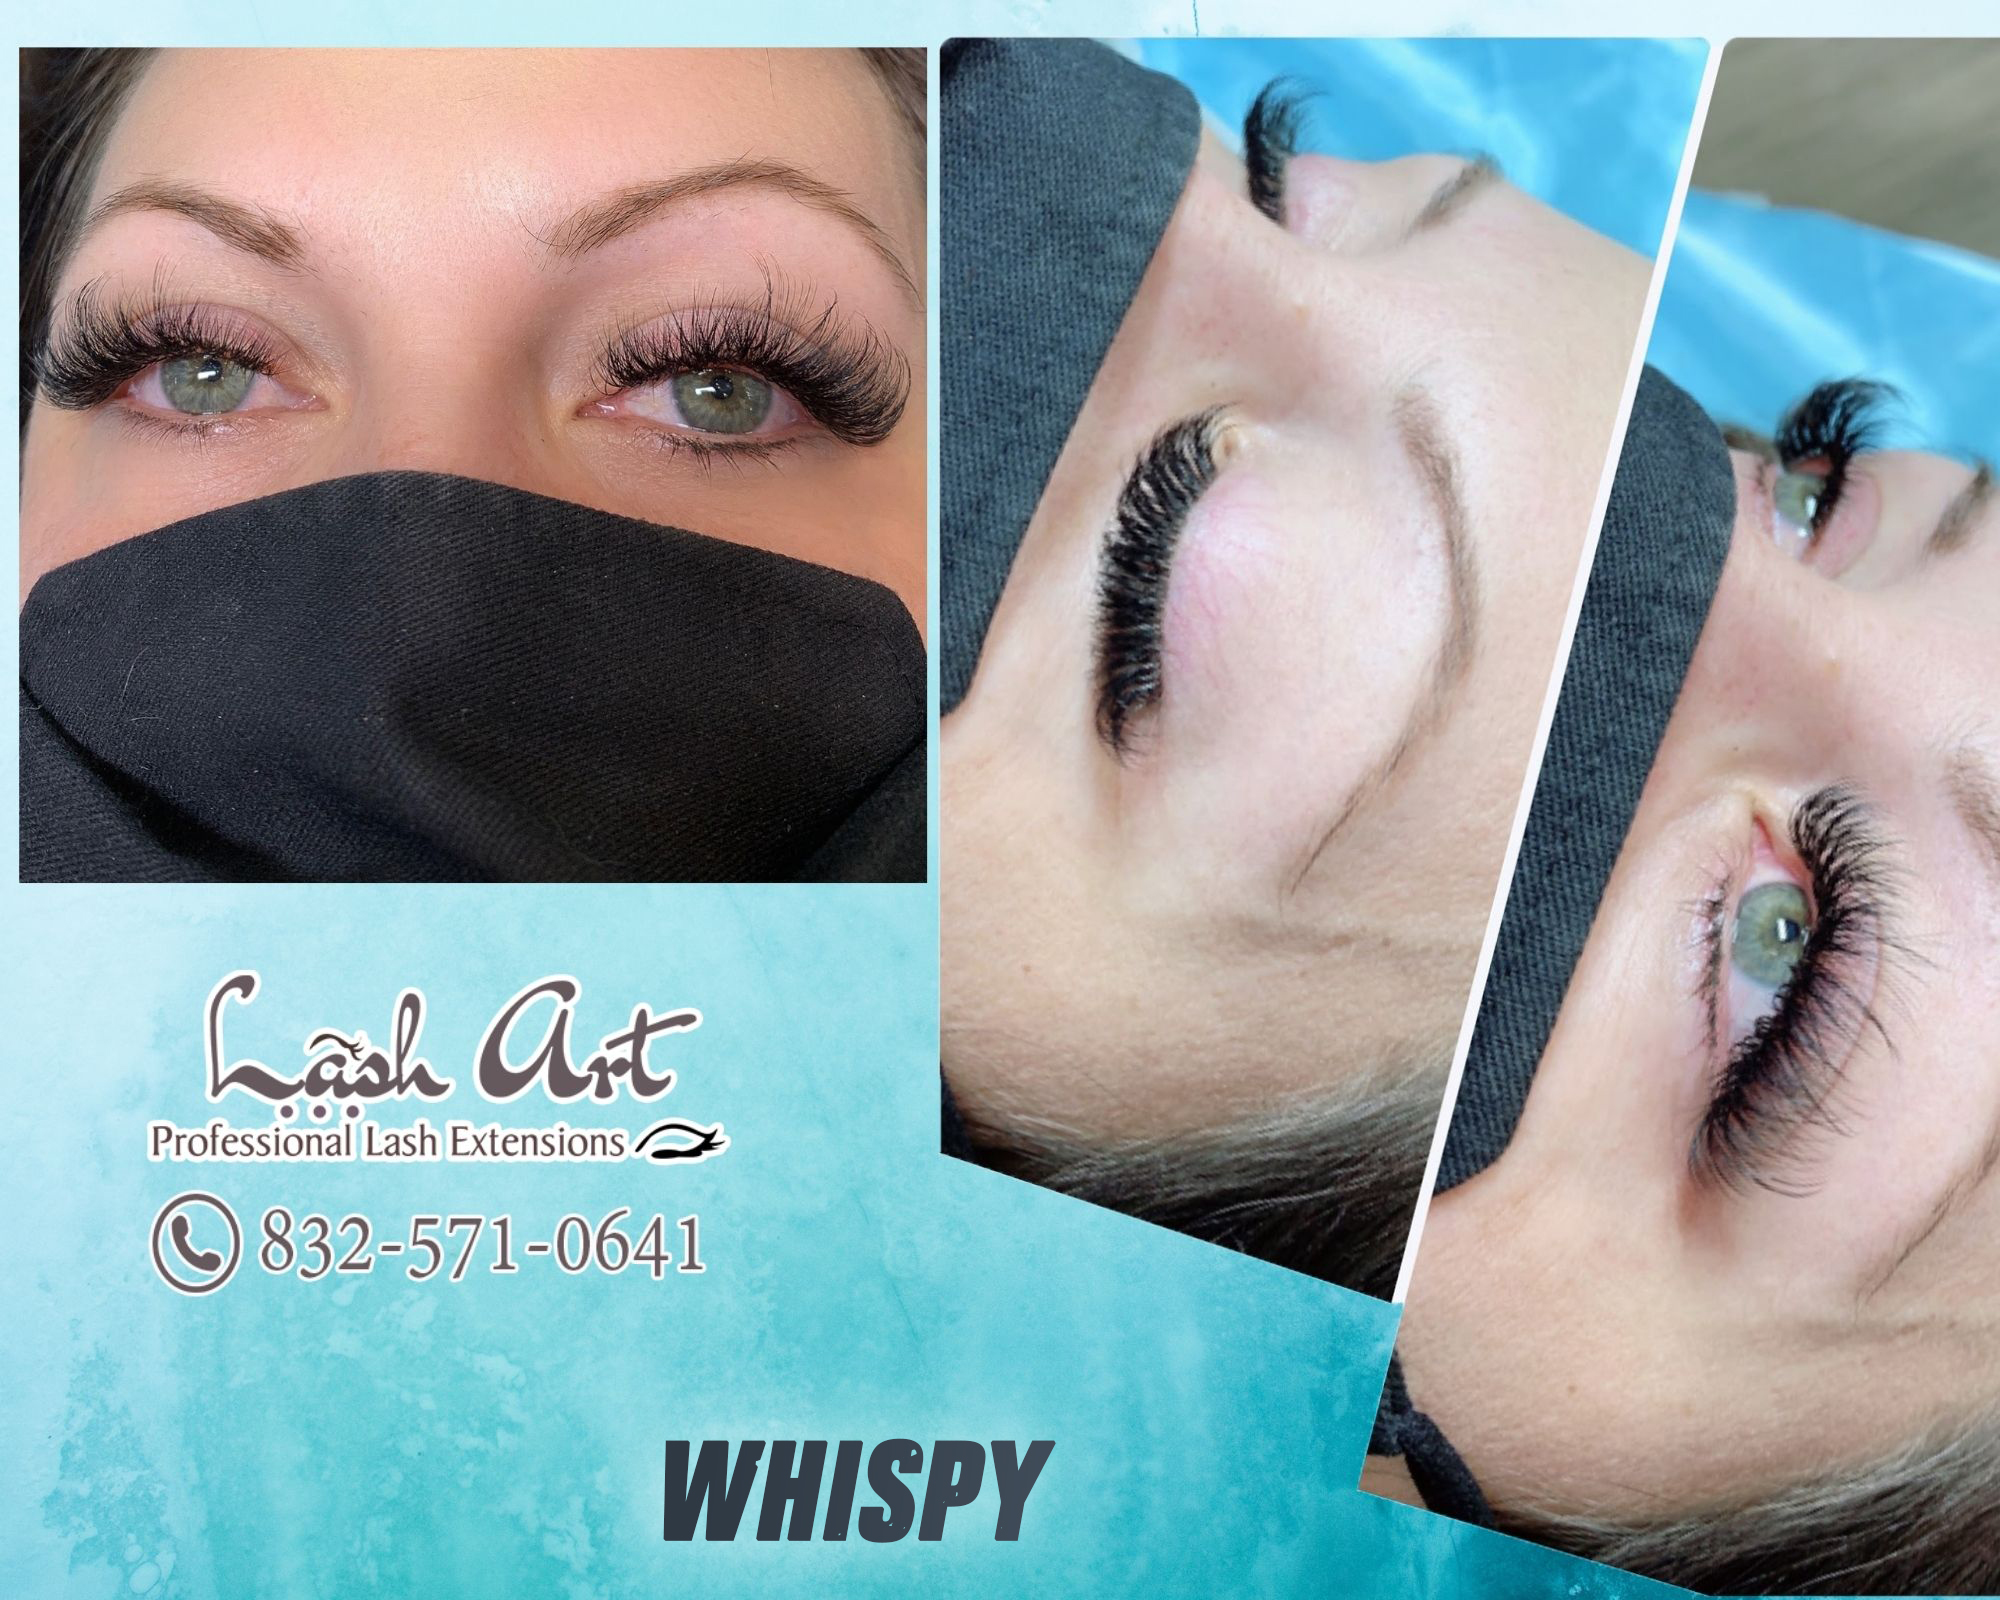 Lash Art | Best eyelash extension in Houston TX 77025